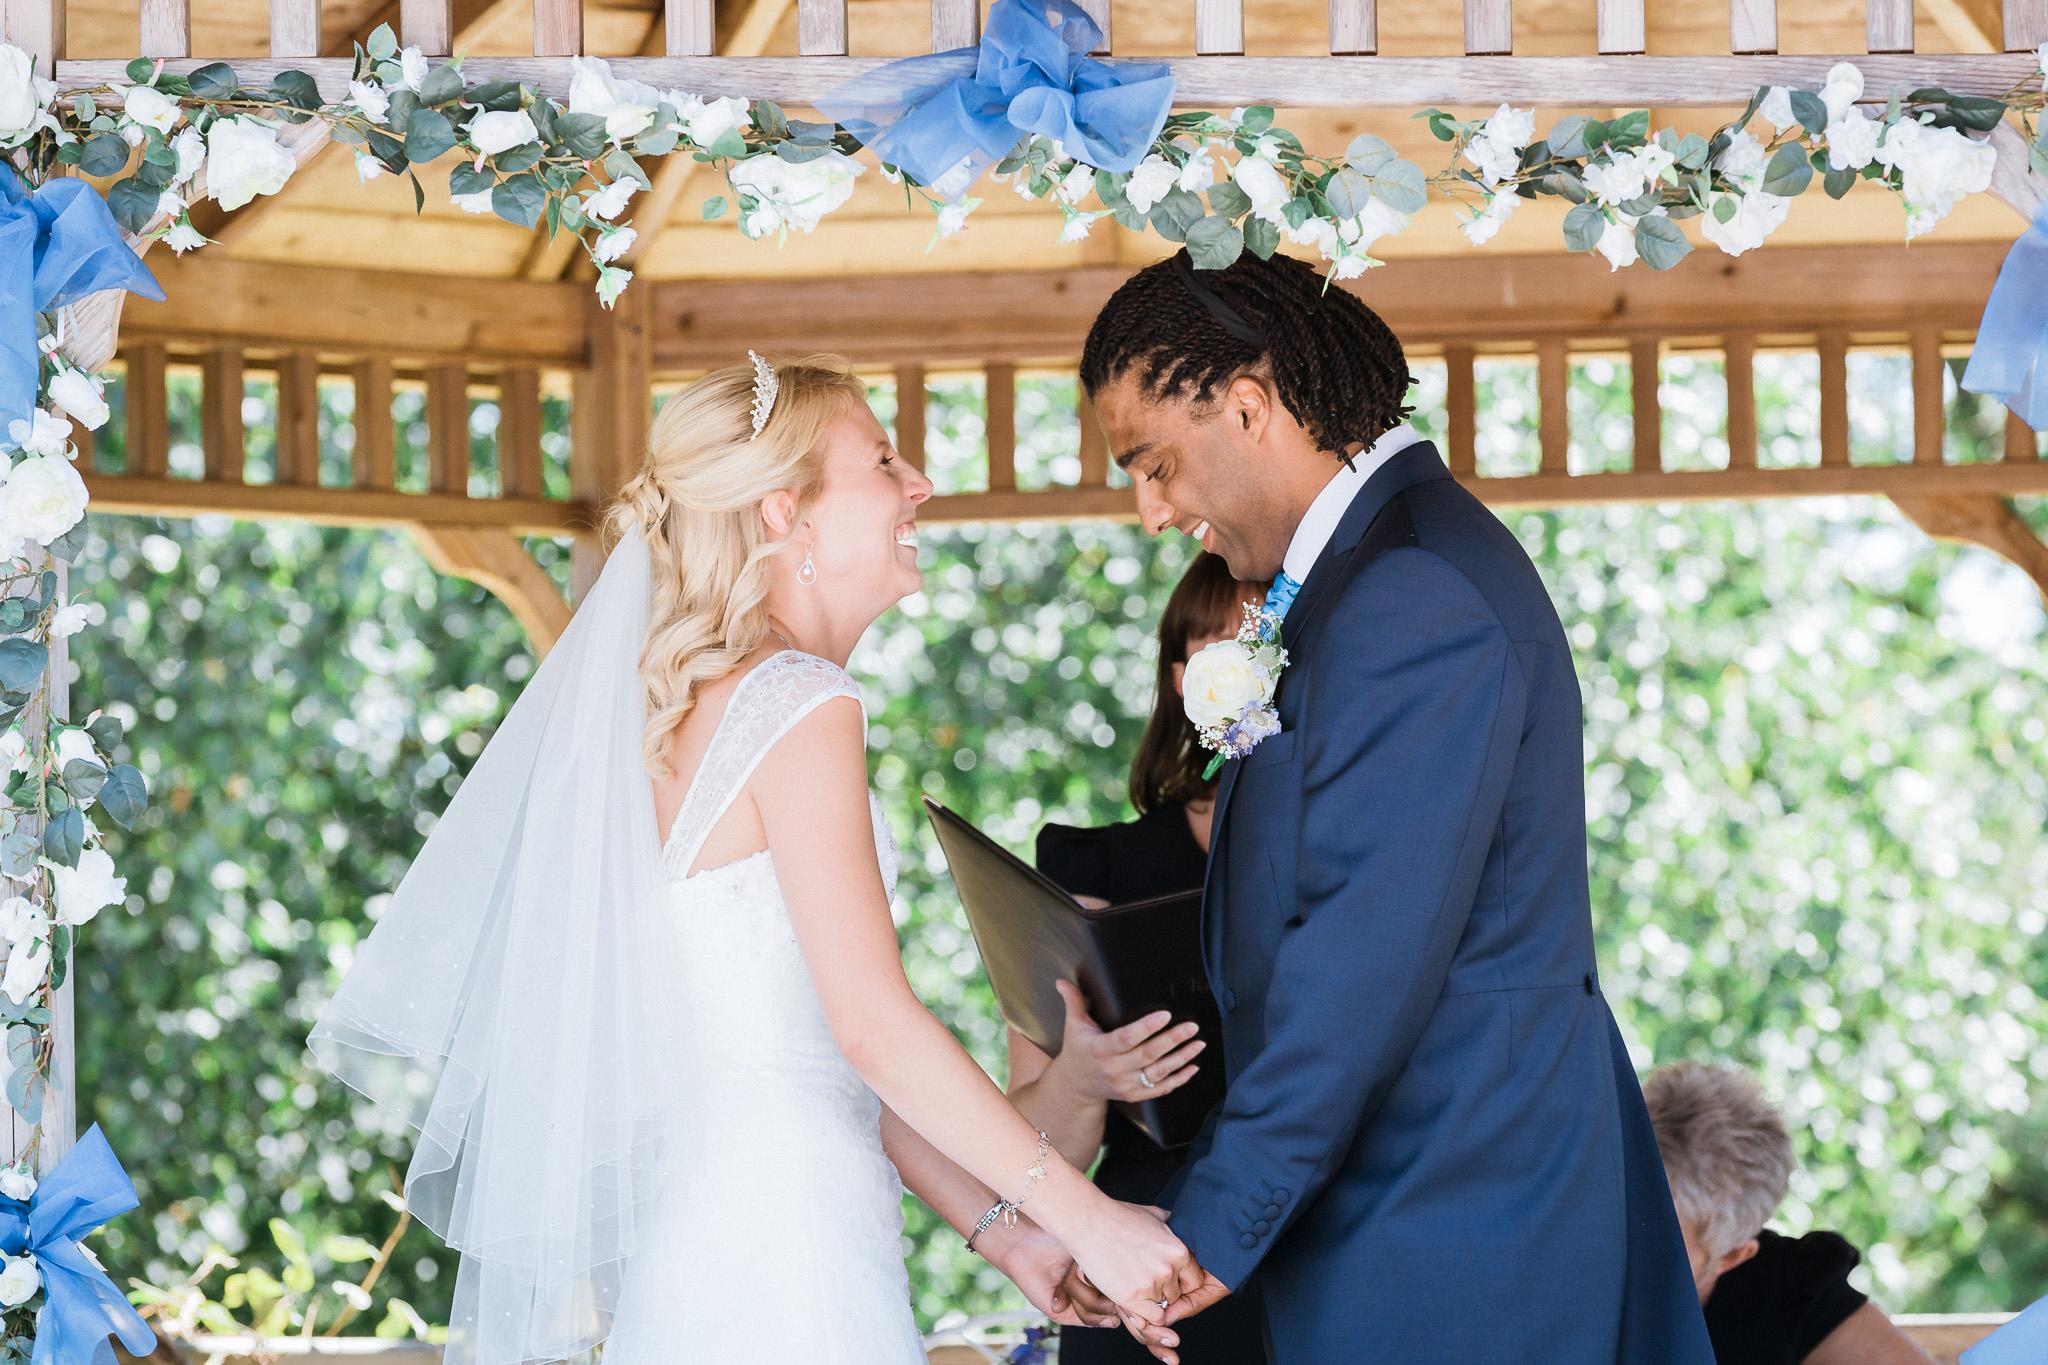 Kent - Wedding – Great Danes Hotel - Matt & Danielle  – Ceremony